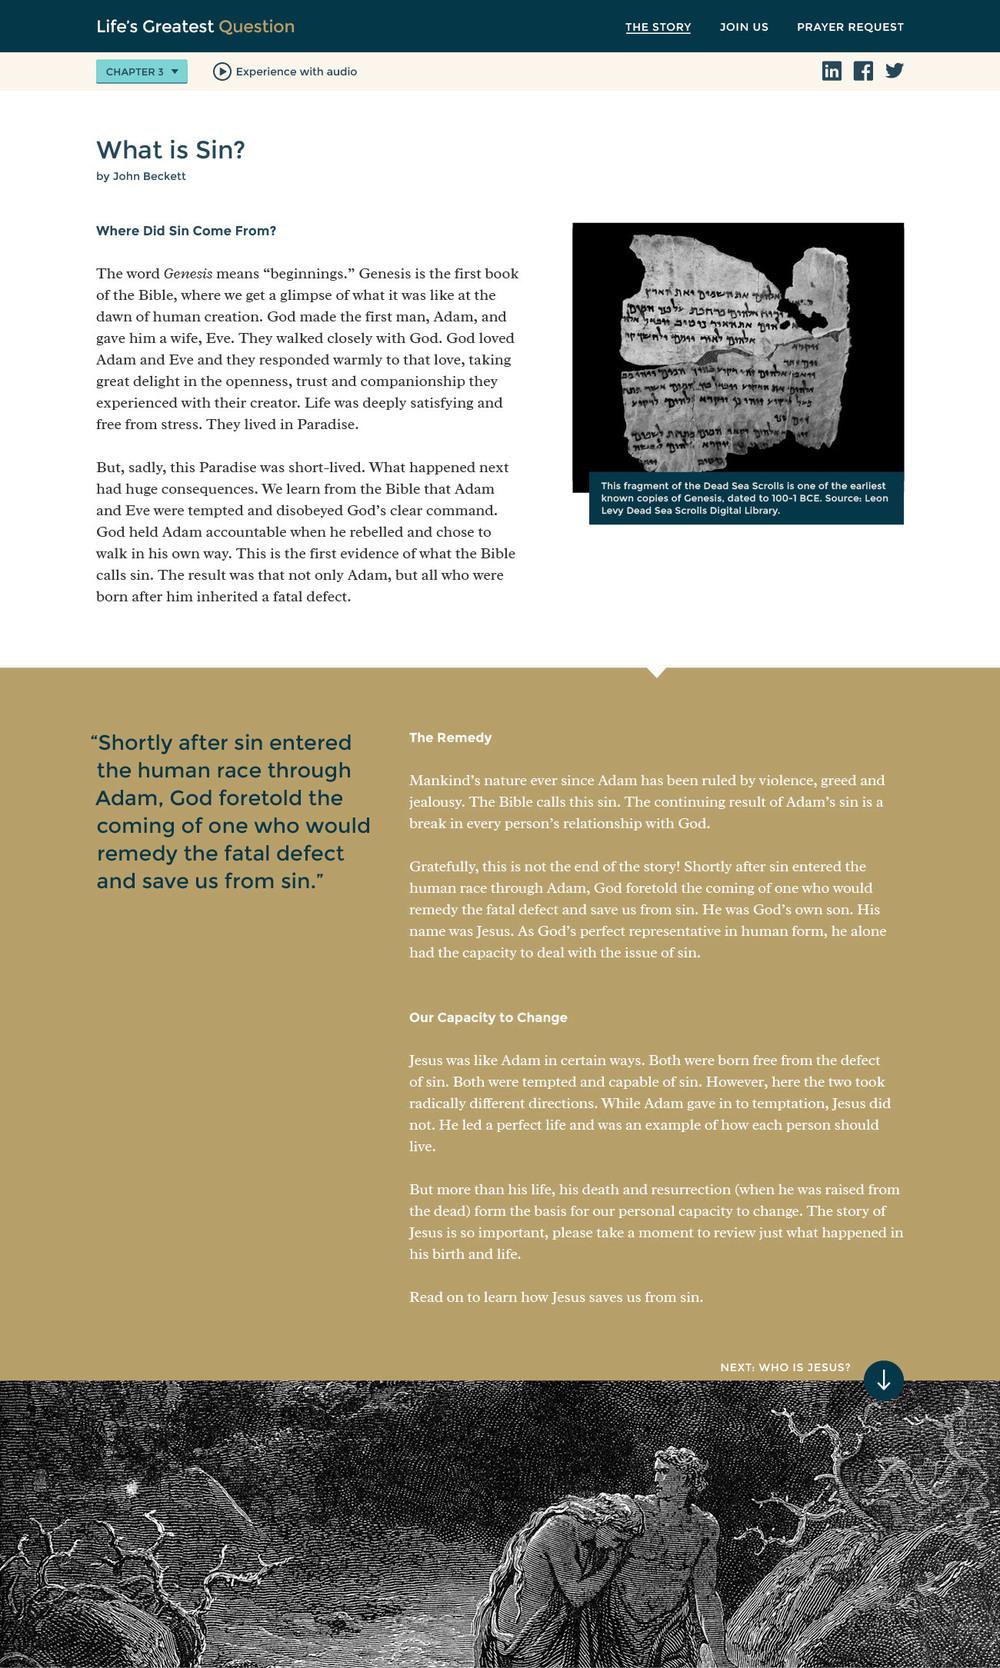 Lifes Greatest Question Chapter 3 website design for desktop.